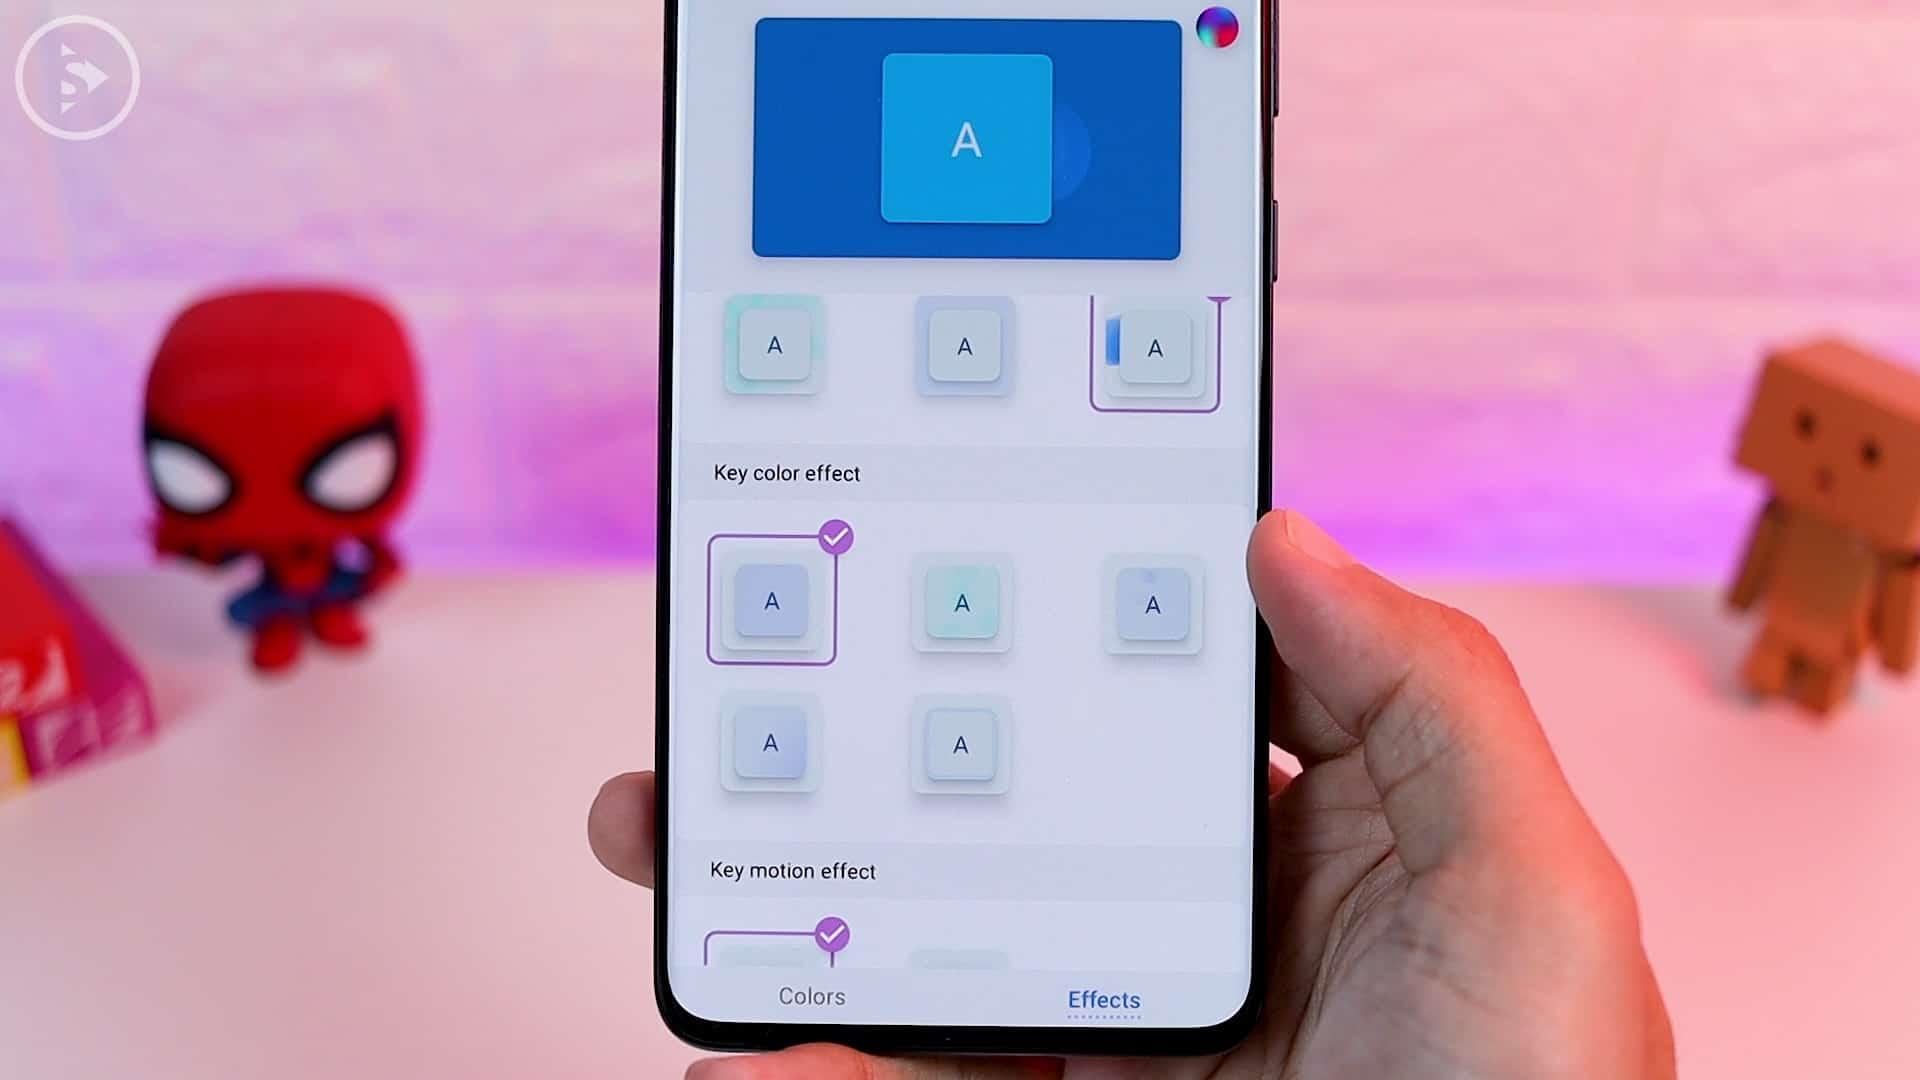 Tips Aplikasi Keys Cafe Terbaru Good Lock - animasi key color effect